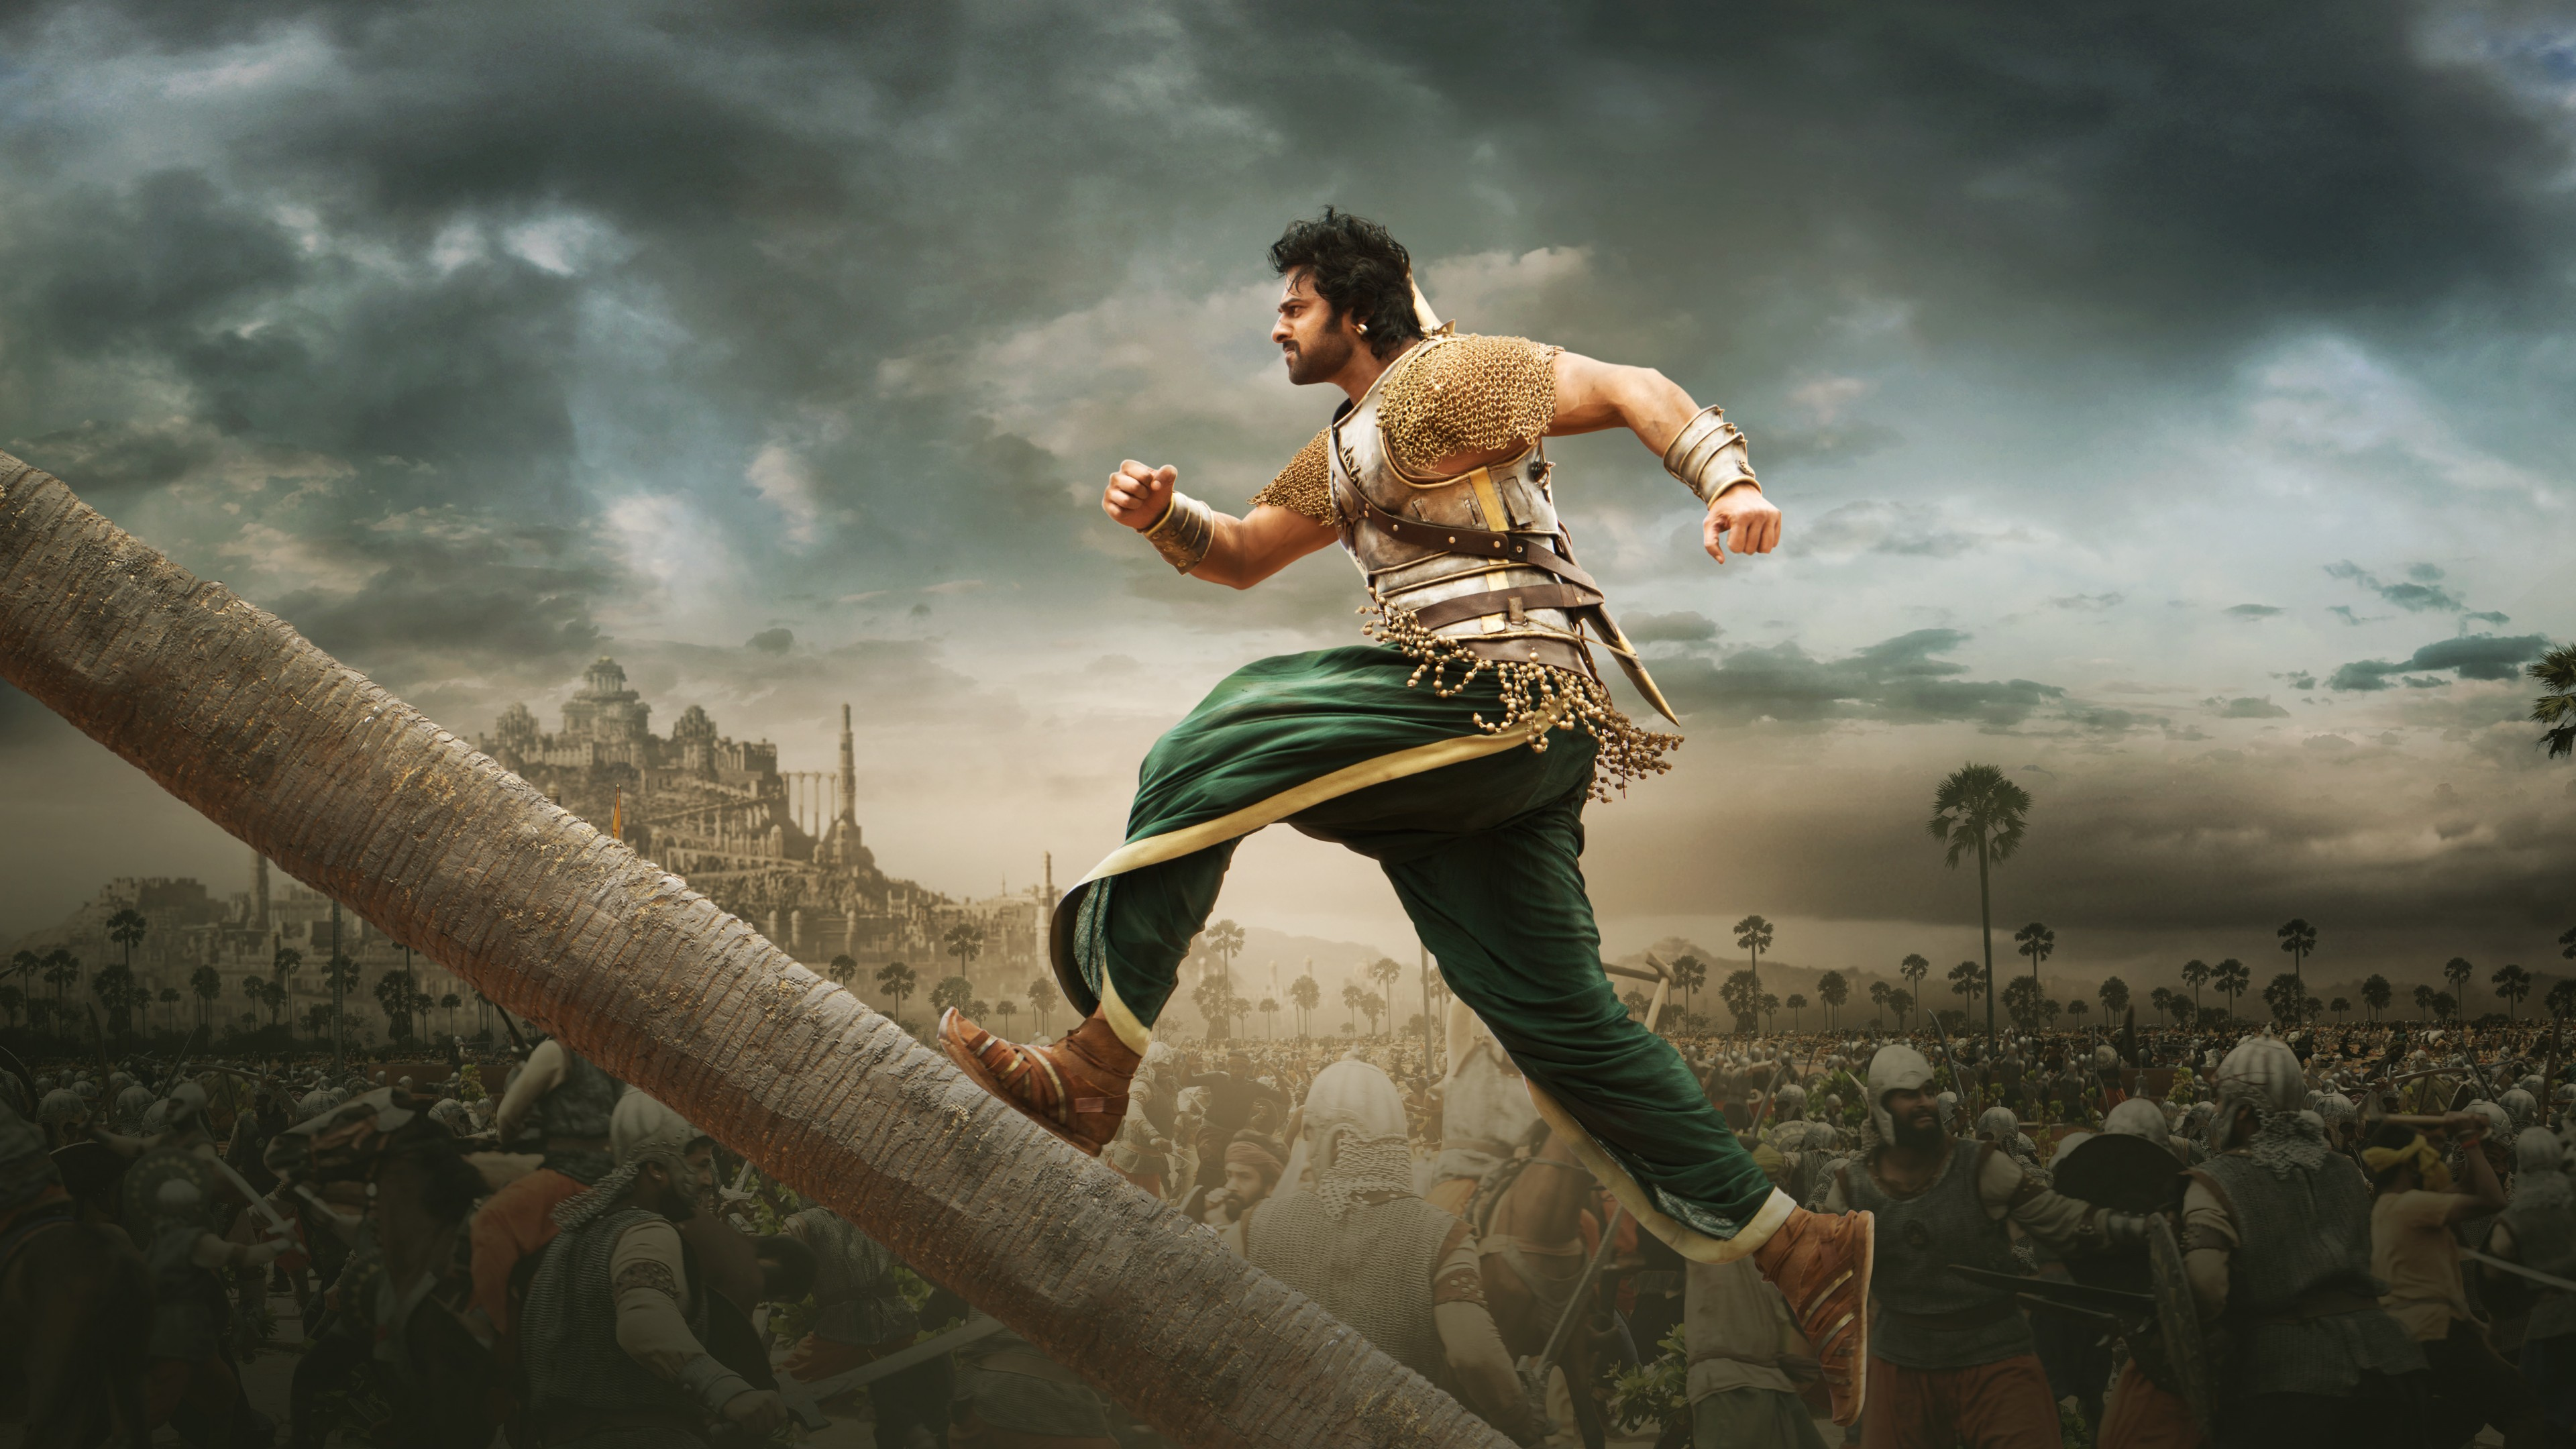 Bahubali 2 conclusion in telugu full movie